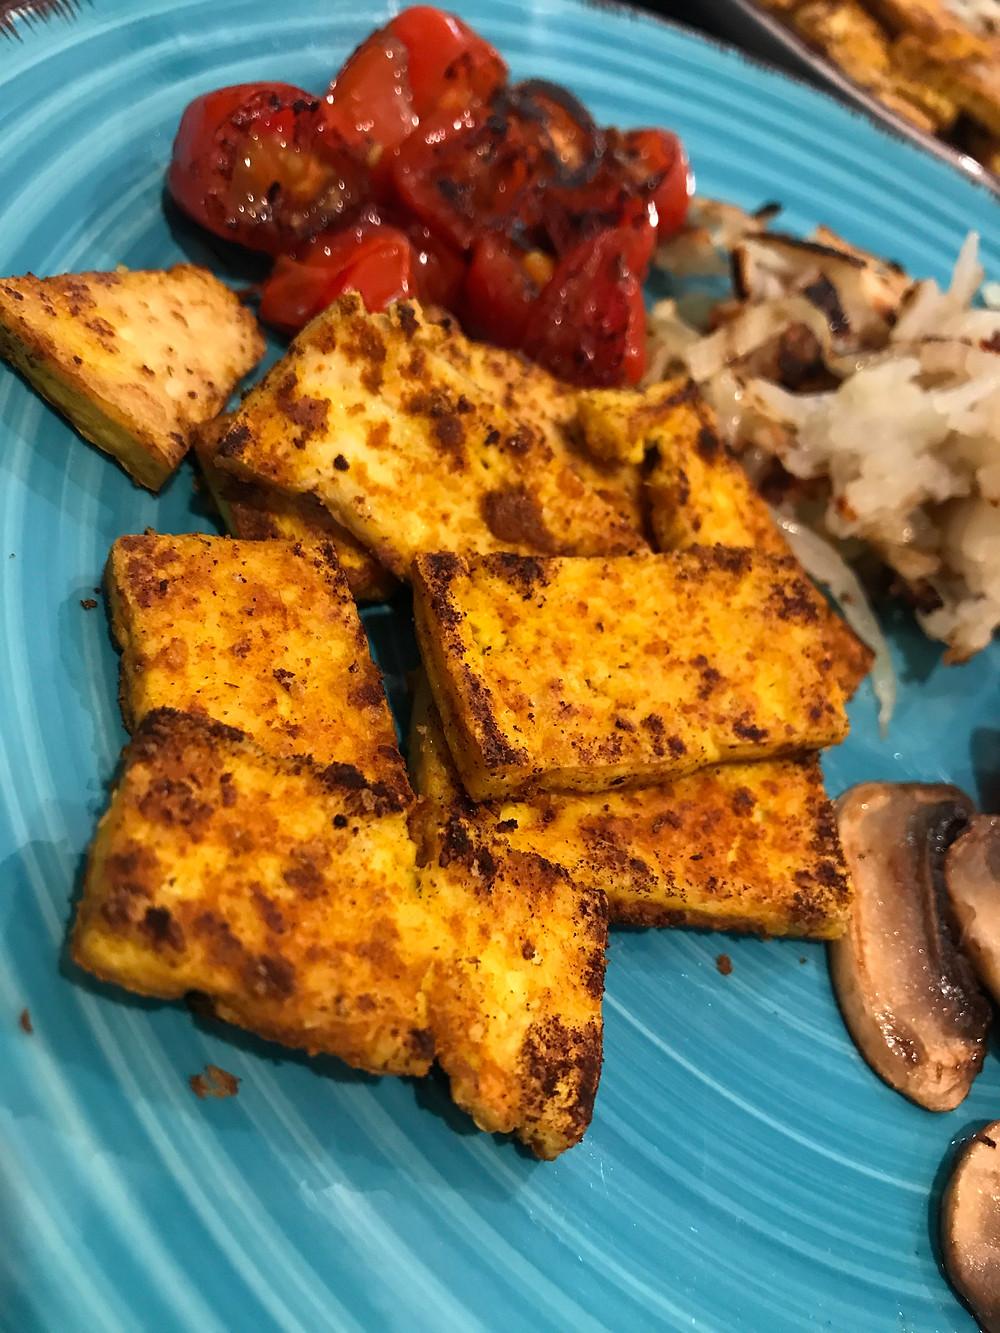 Healthy Vegan Low-Fat Breakfast Tofu